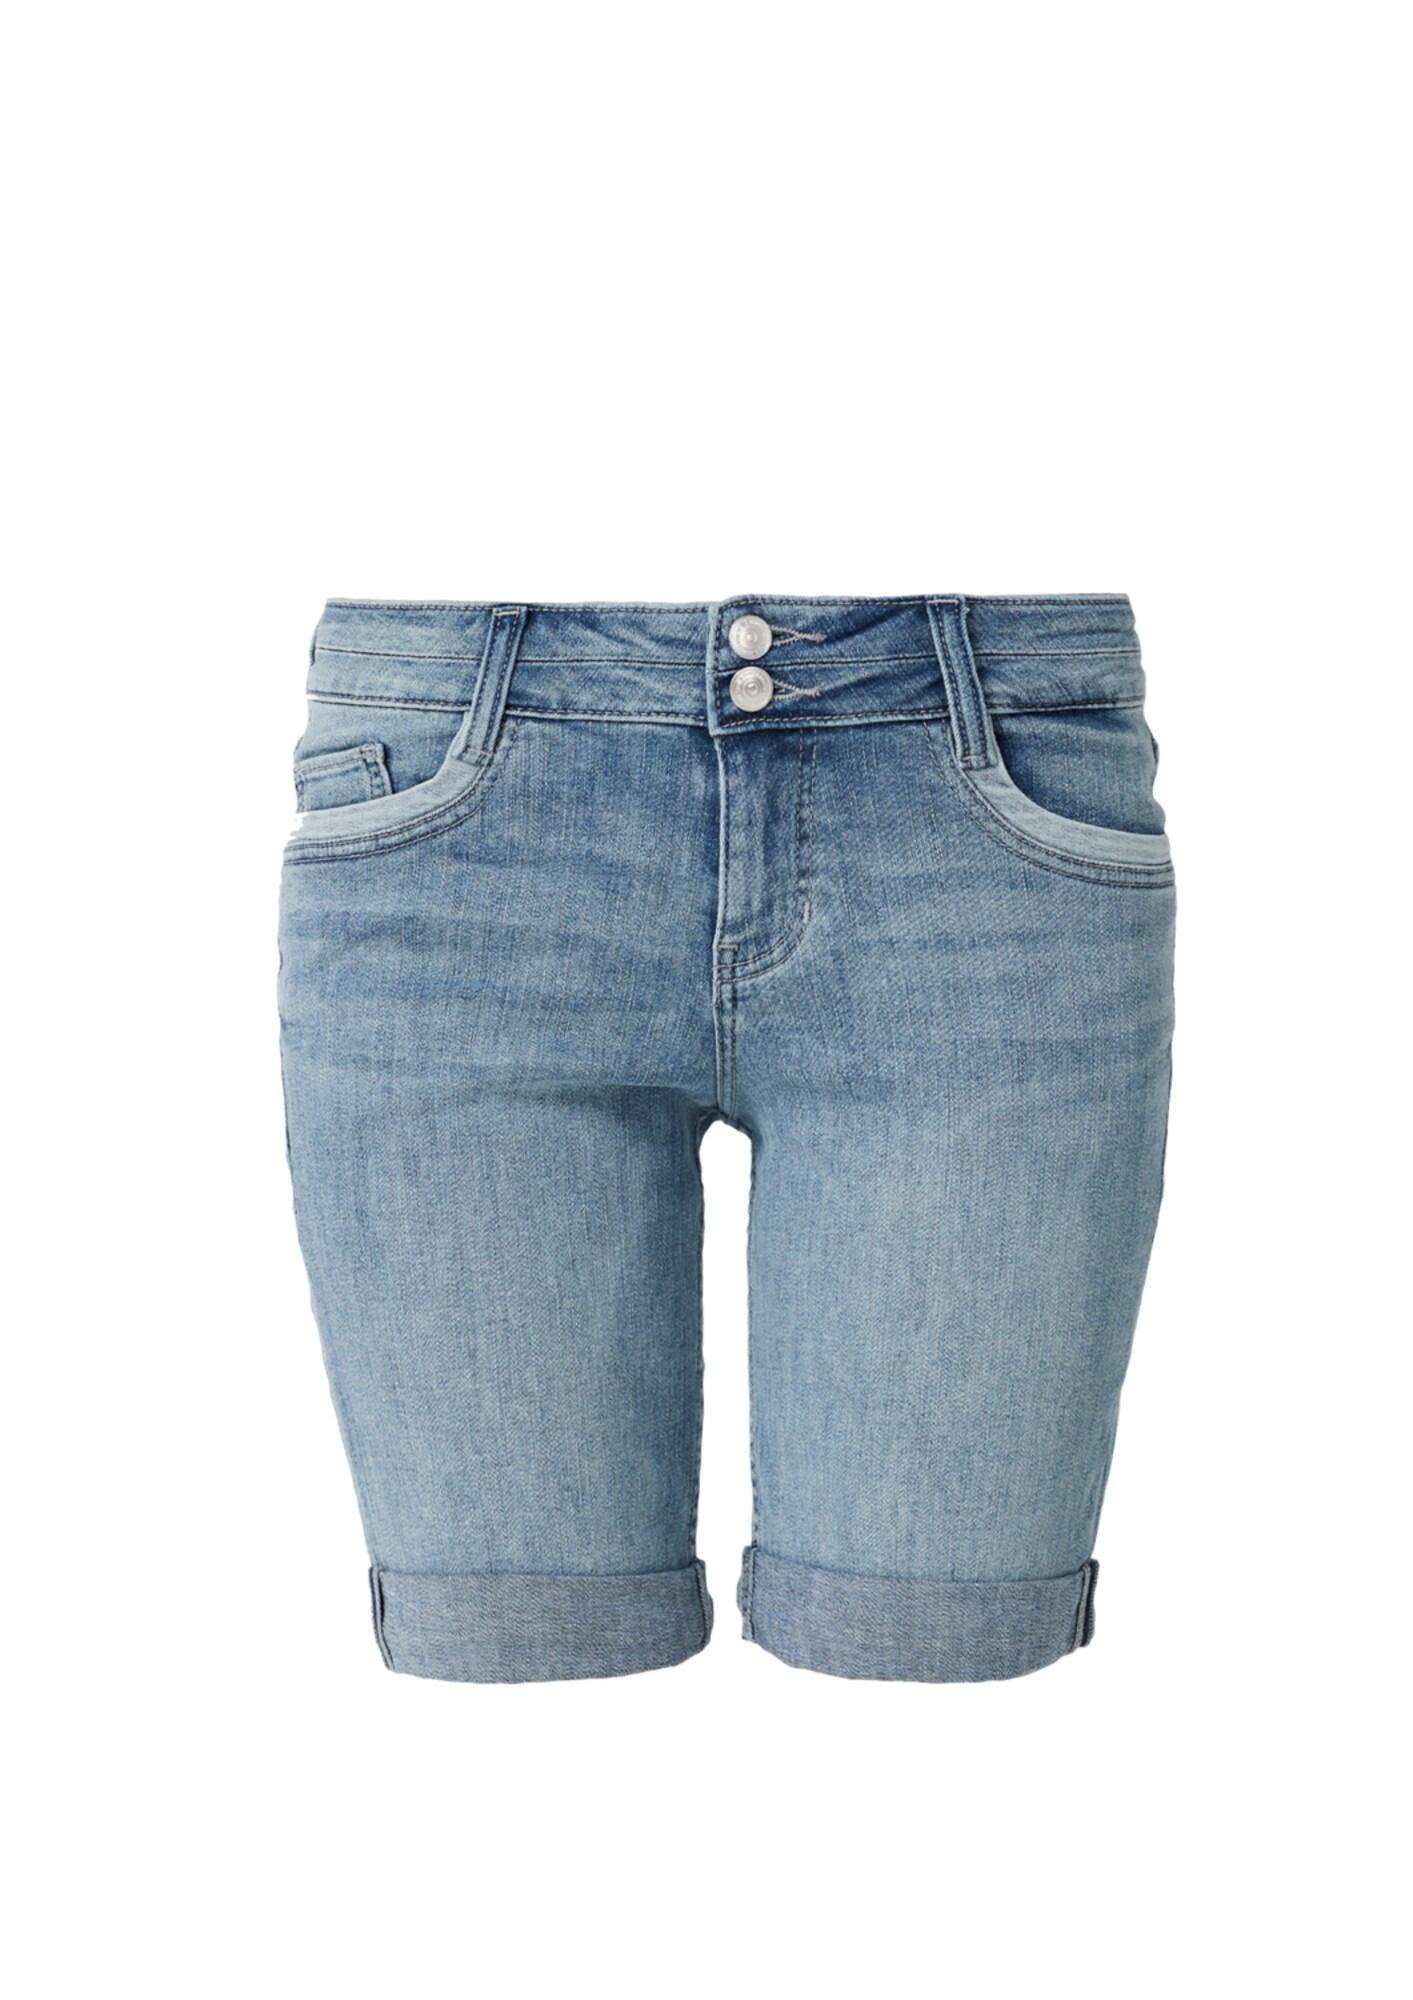 S.oliver Smart Bermuda: Stretchige Jeansshorts in Blau fqePY